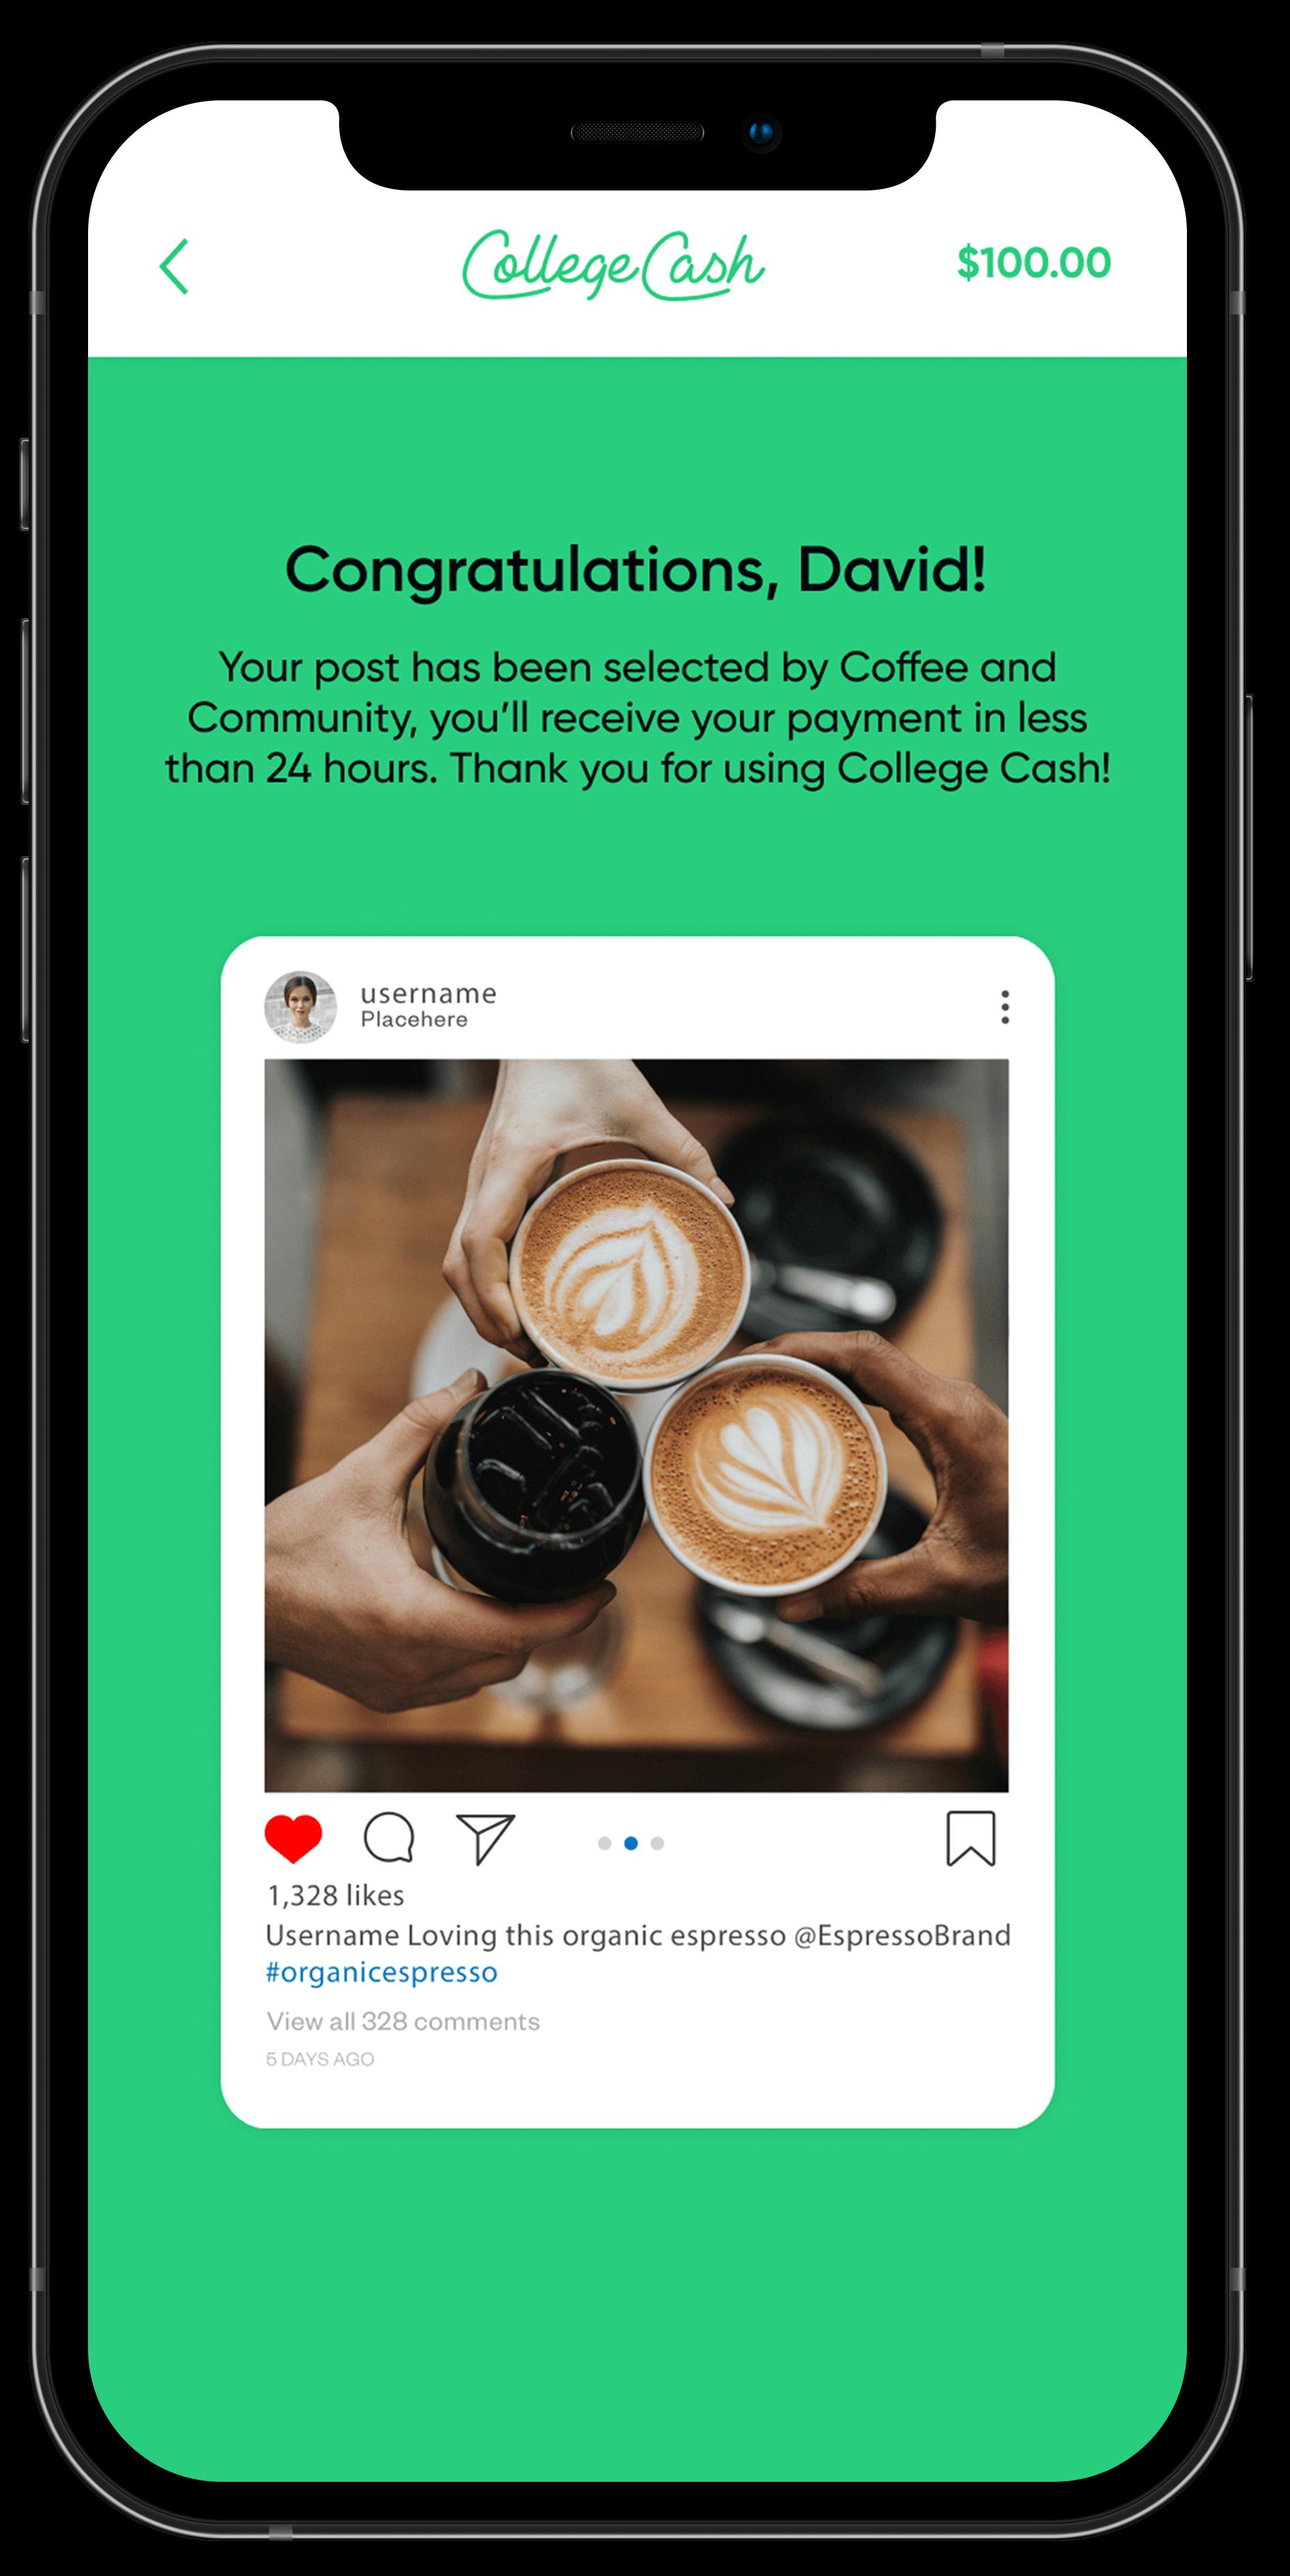 Mockup of congratulations screen in College Cash app